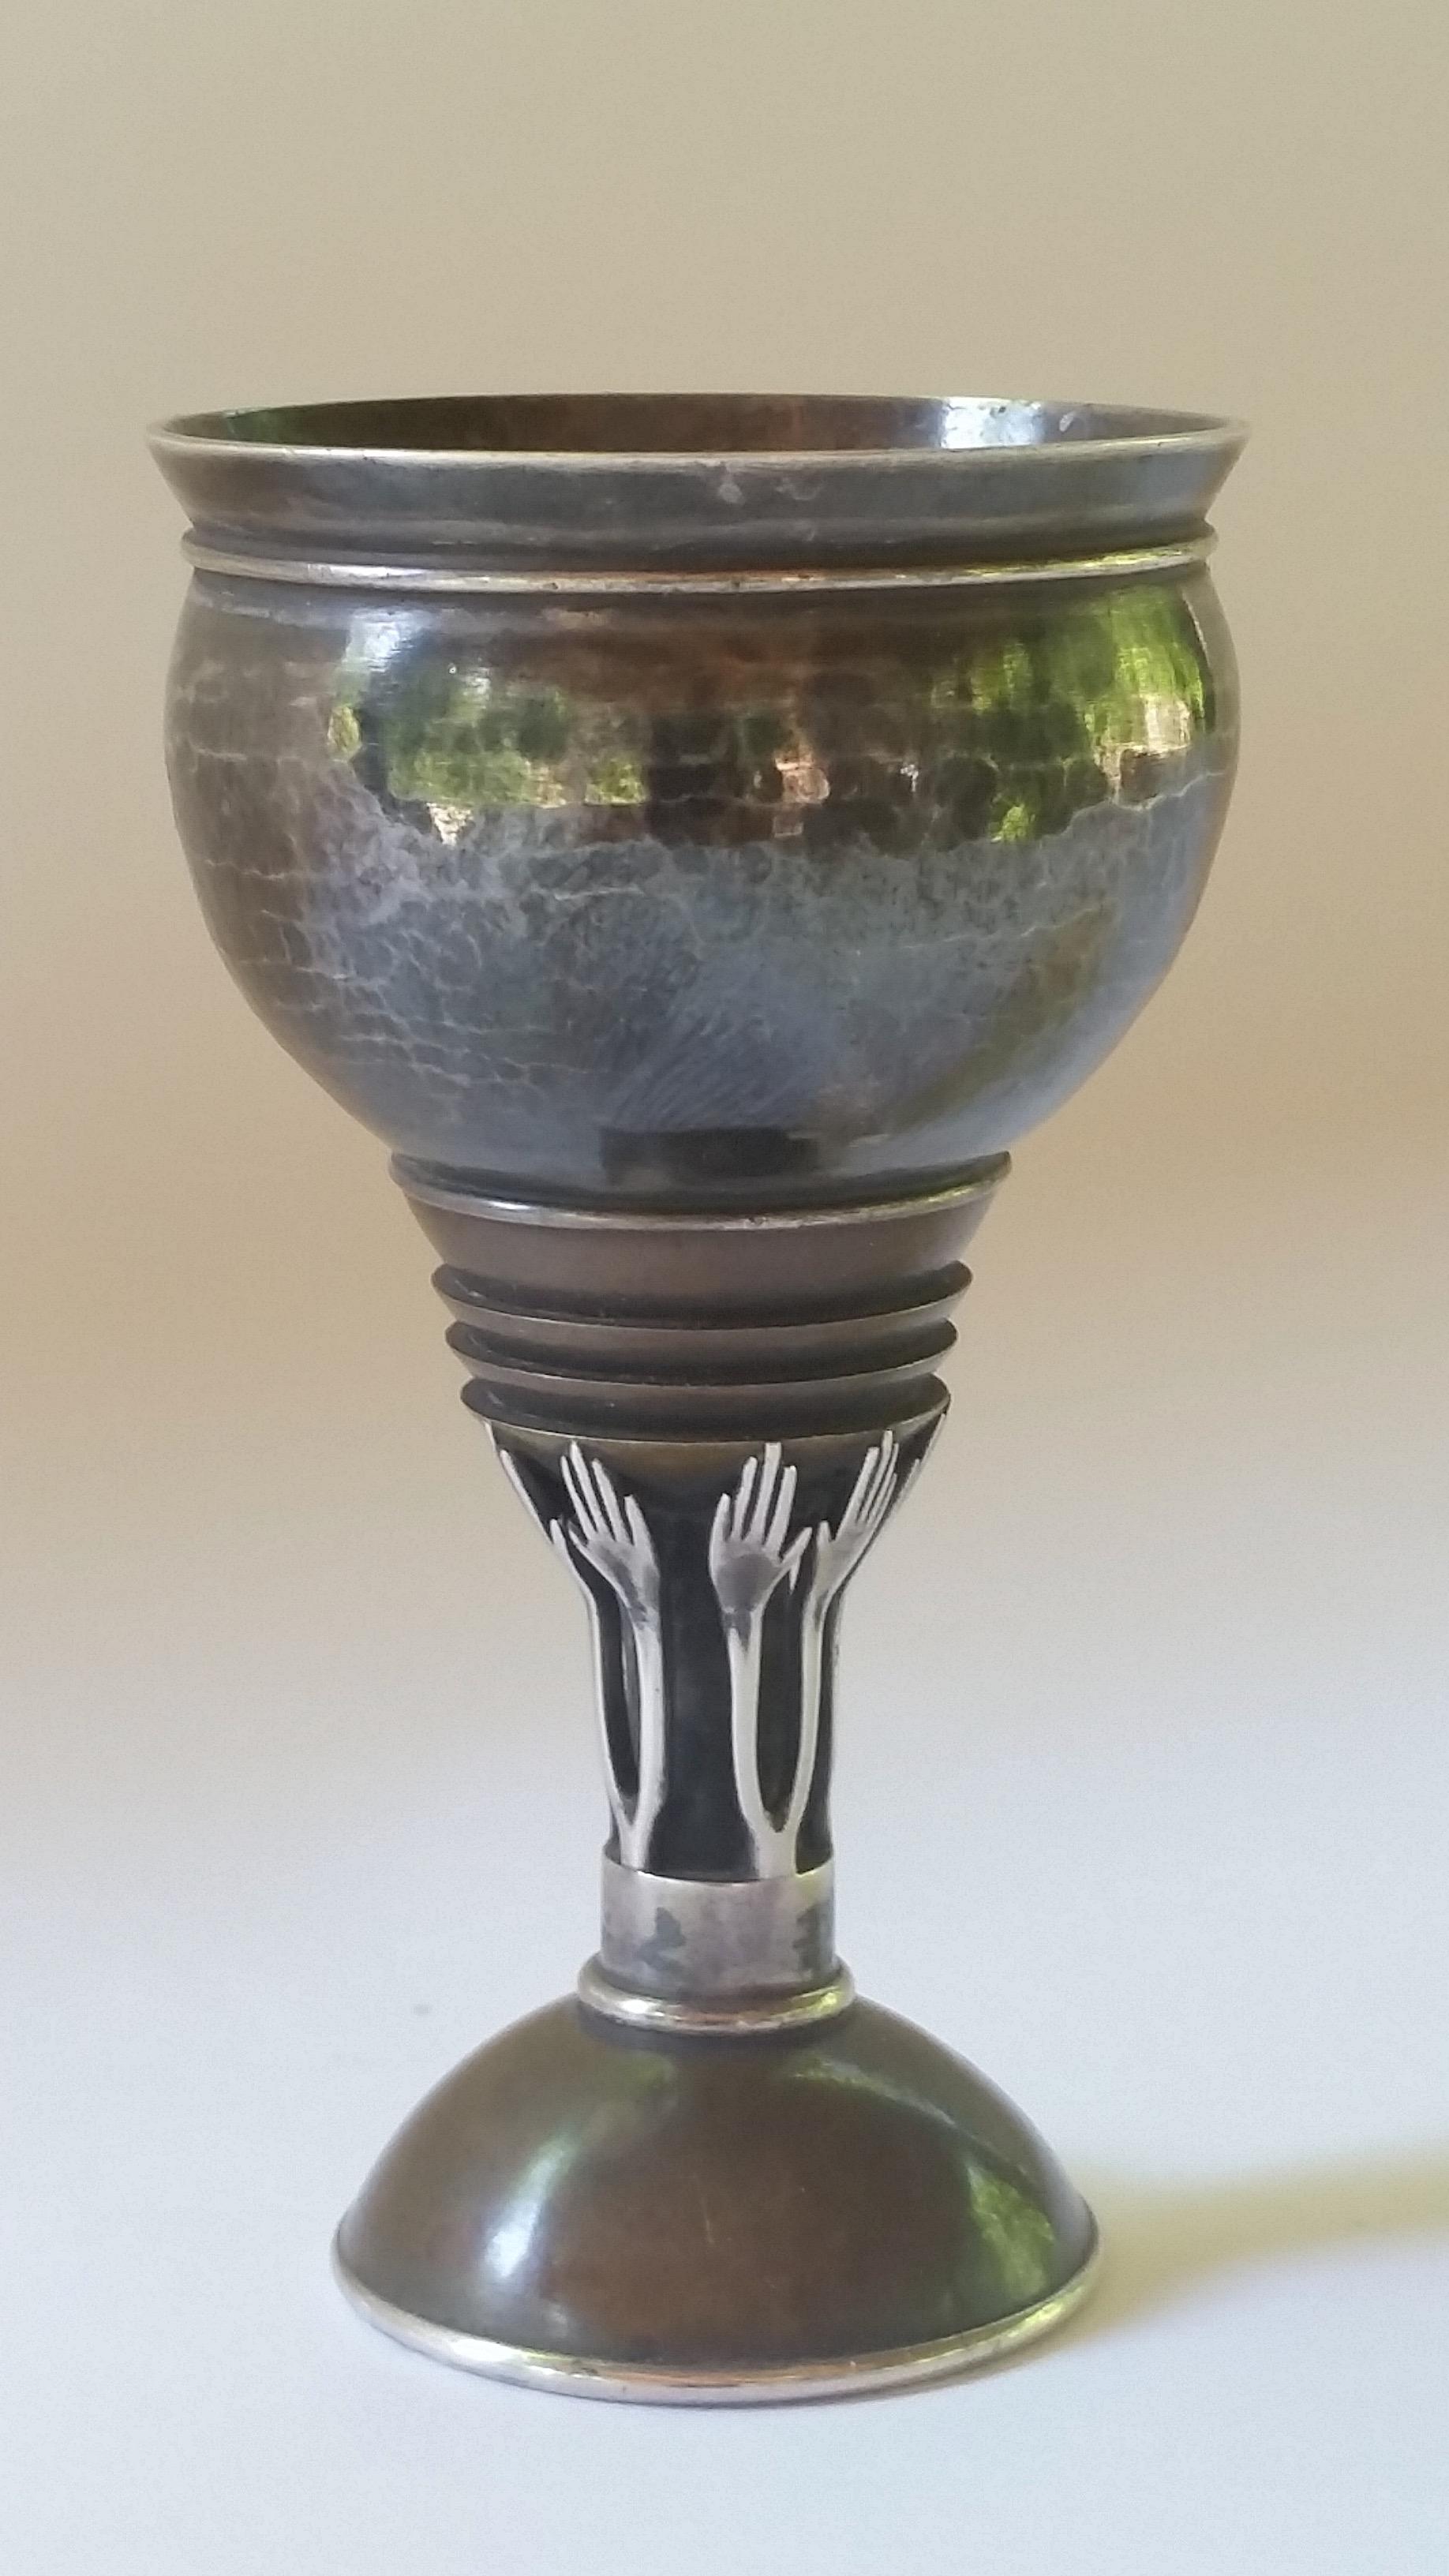 #2.jpg   cup, sterling, copper. 7.5 cm h, 4 cm w, 4.2 cm w.$6000.jpg